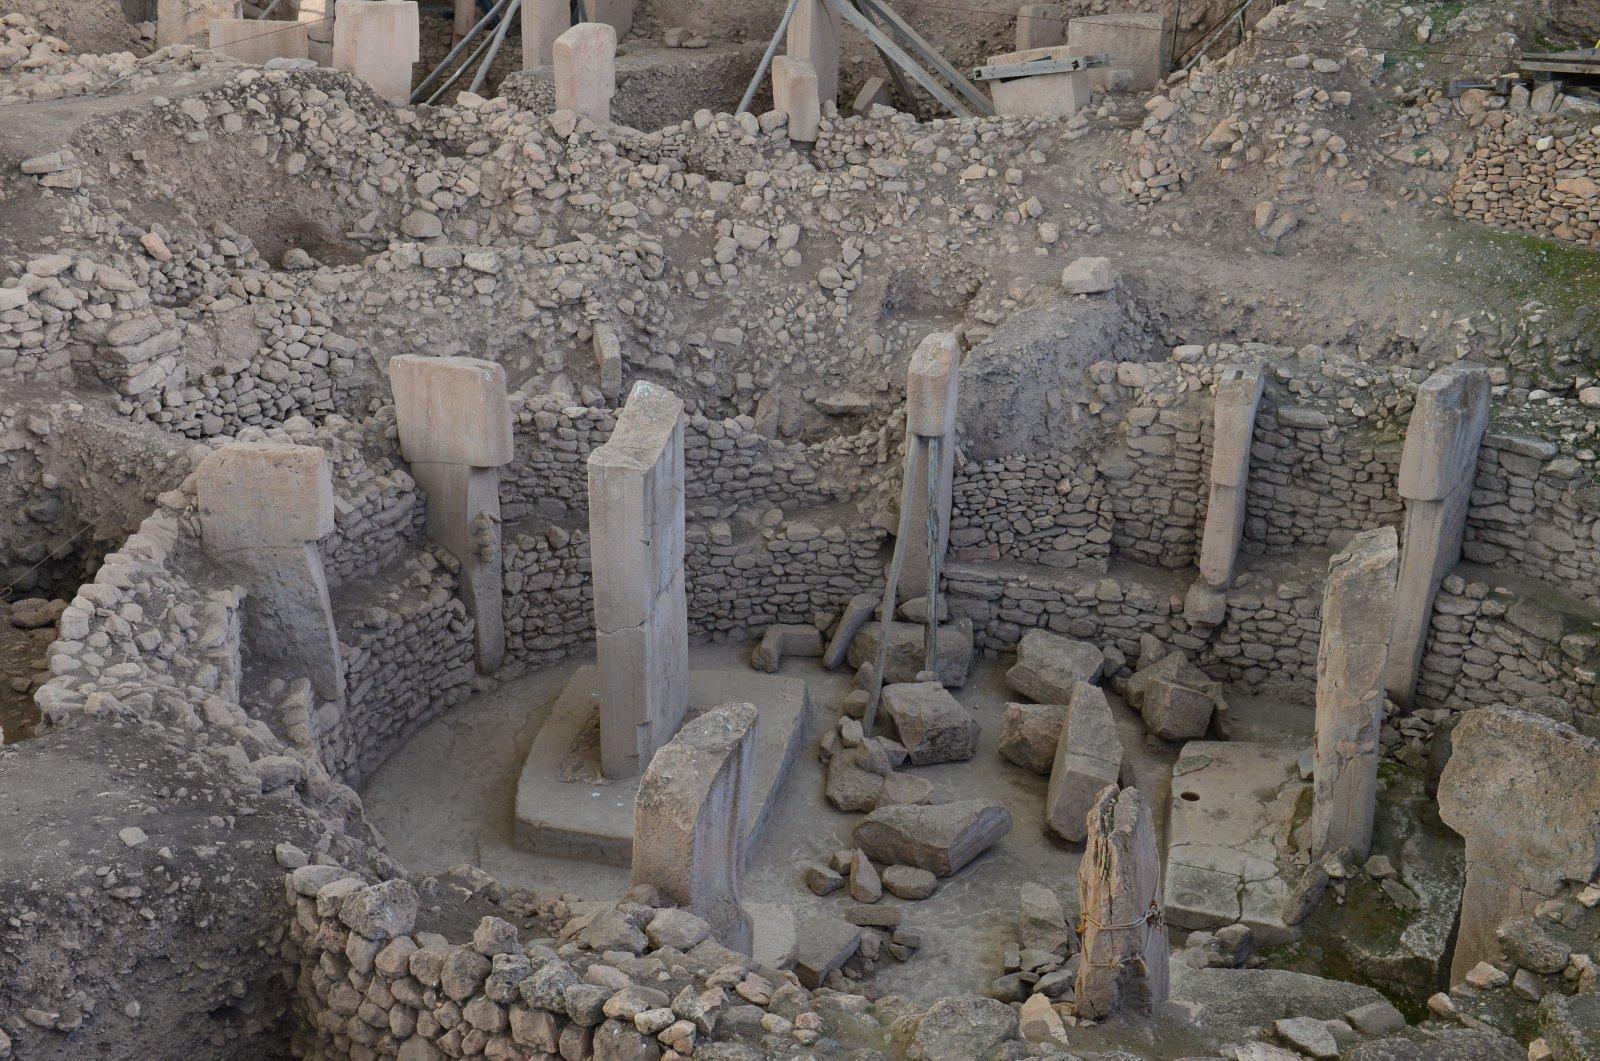 The monoliths are seen in this photo taken in Göbeklitepe, Turkey, April 21, 2021. (AA Photo)